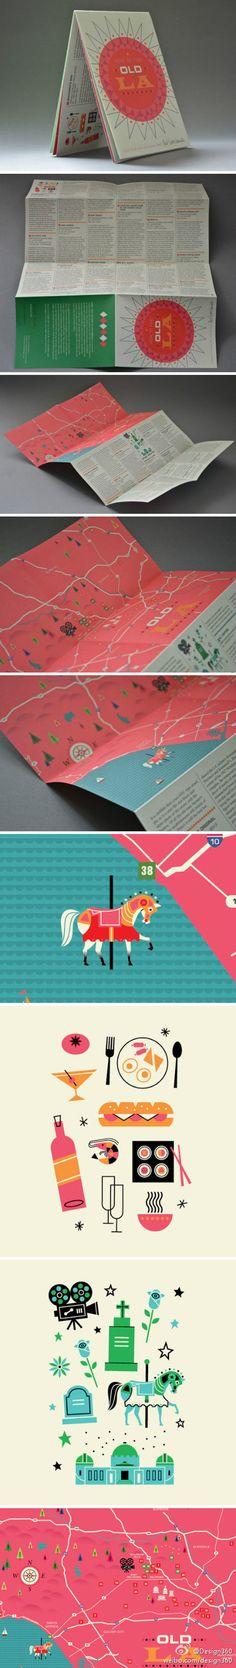 Los Angeles Map Design by Brad Woodward & Herb Lester-www.design360.cn